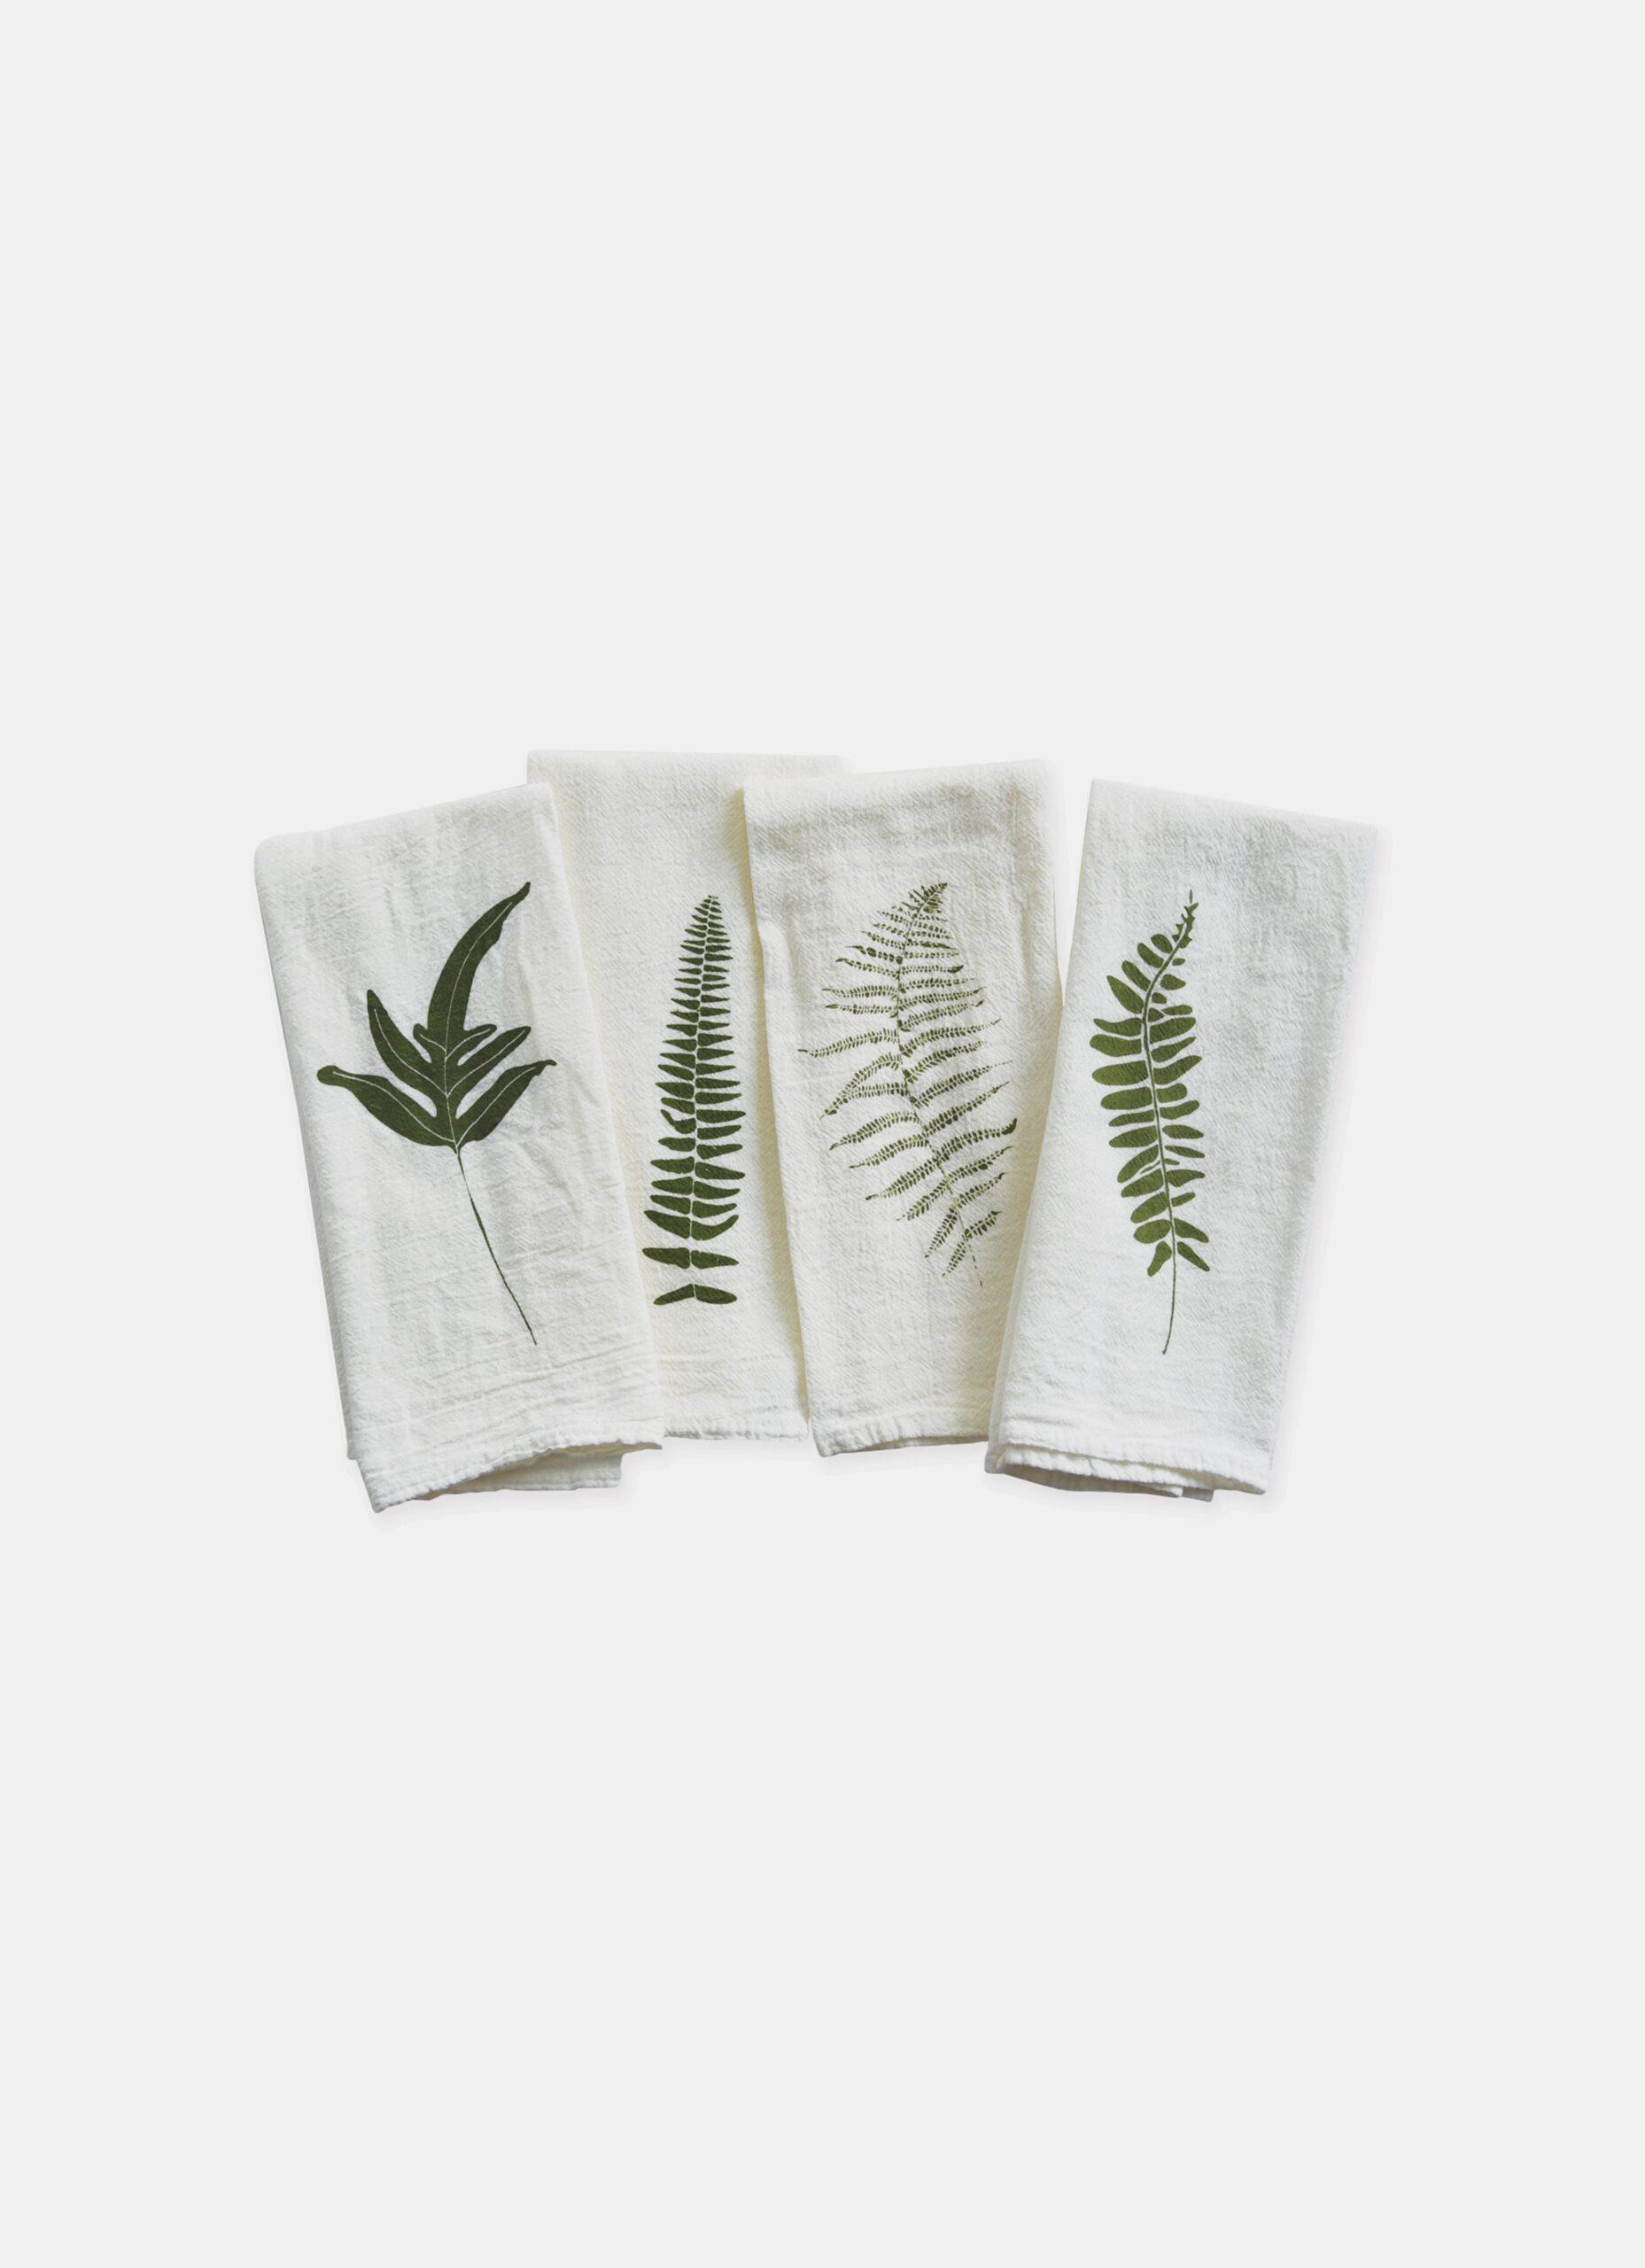 June and December - Set of 4 Cotton Napkins - Wild Fern - 38 x 50cm